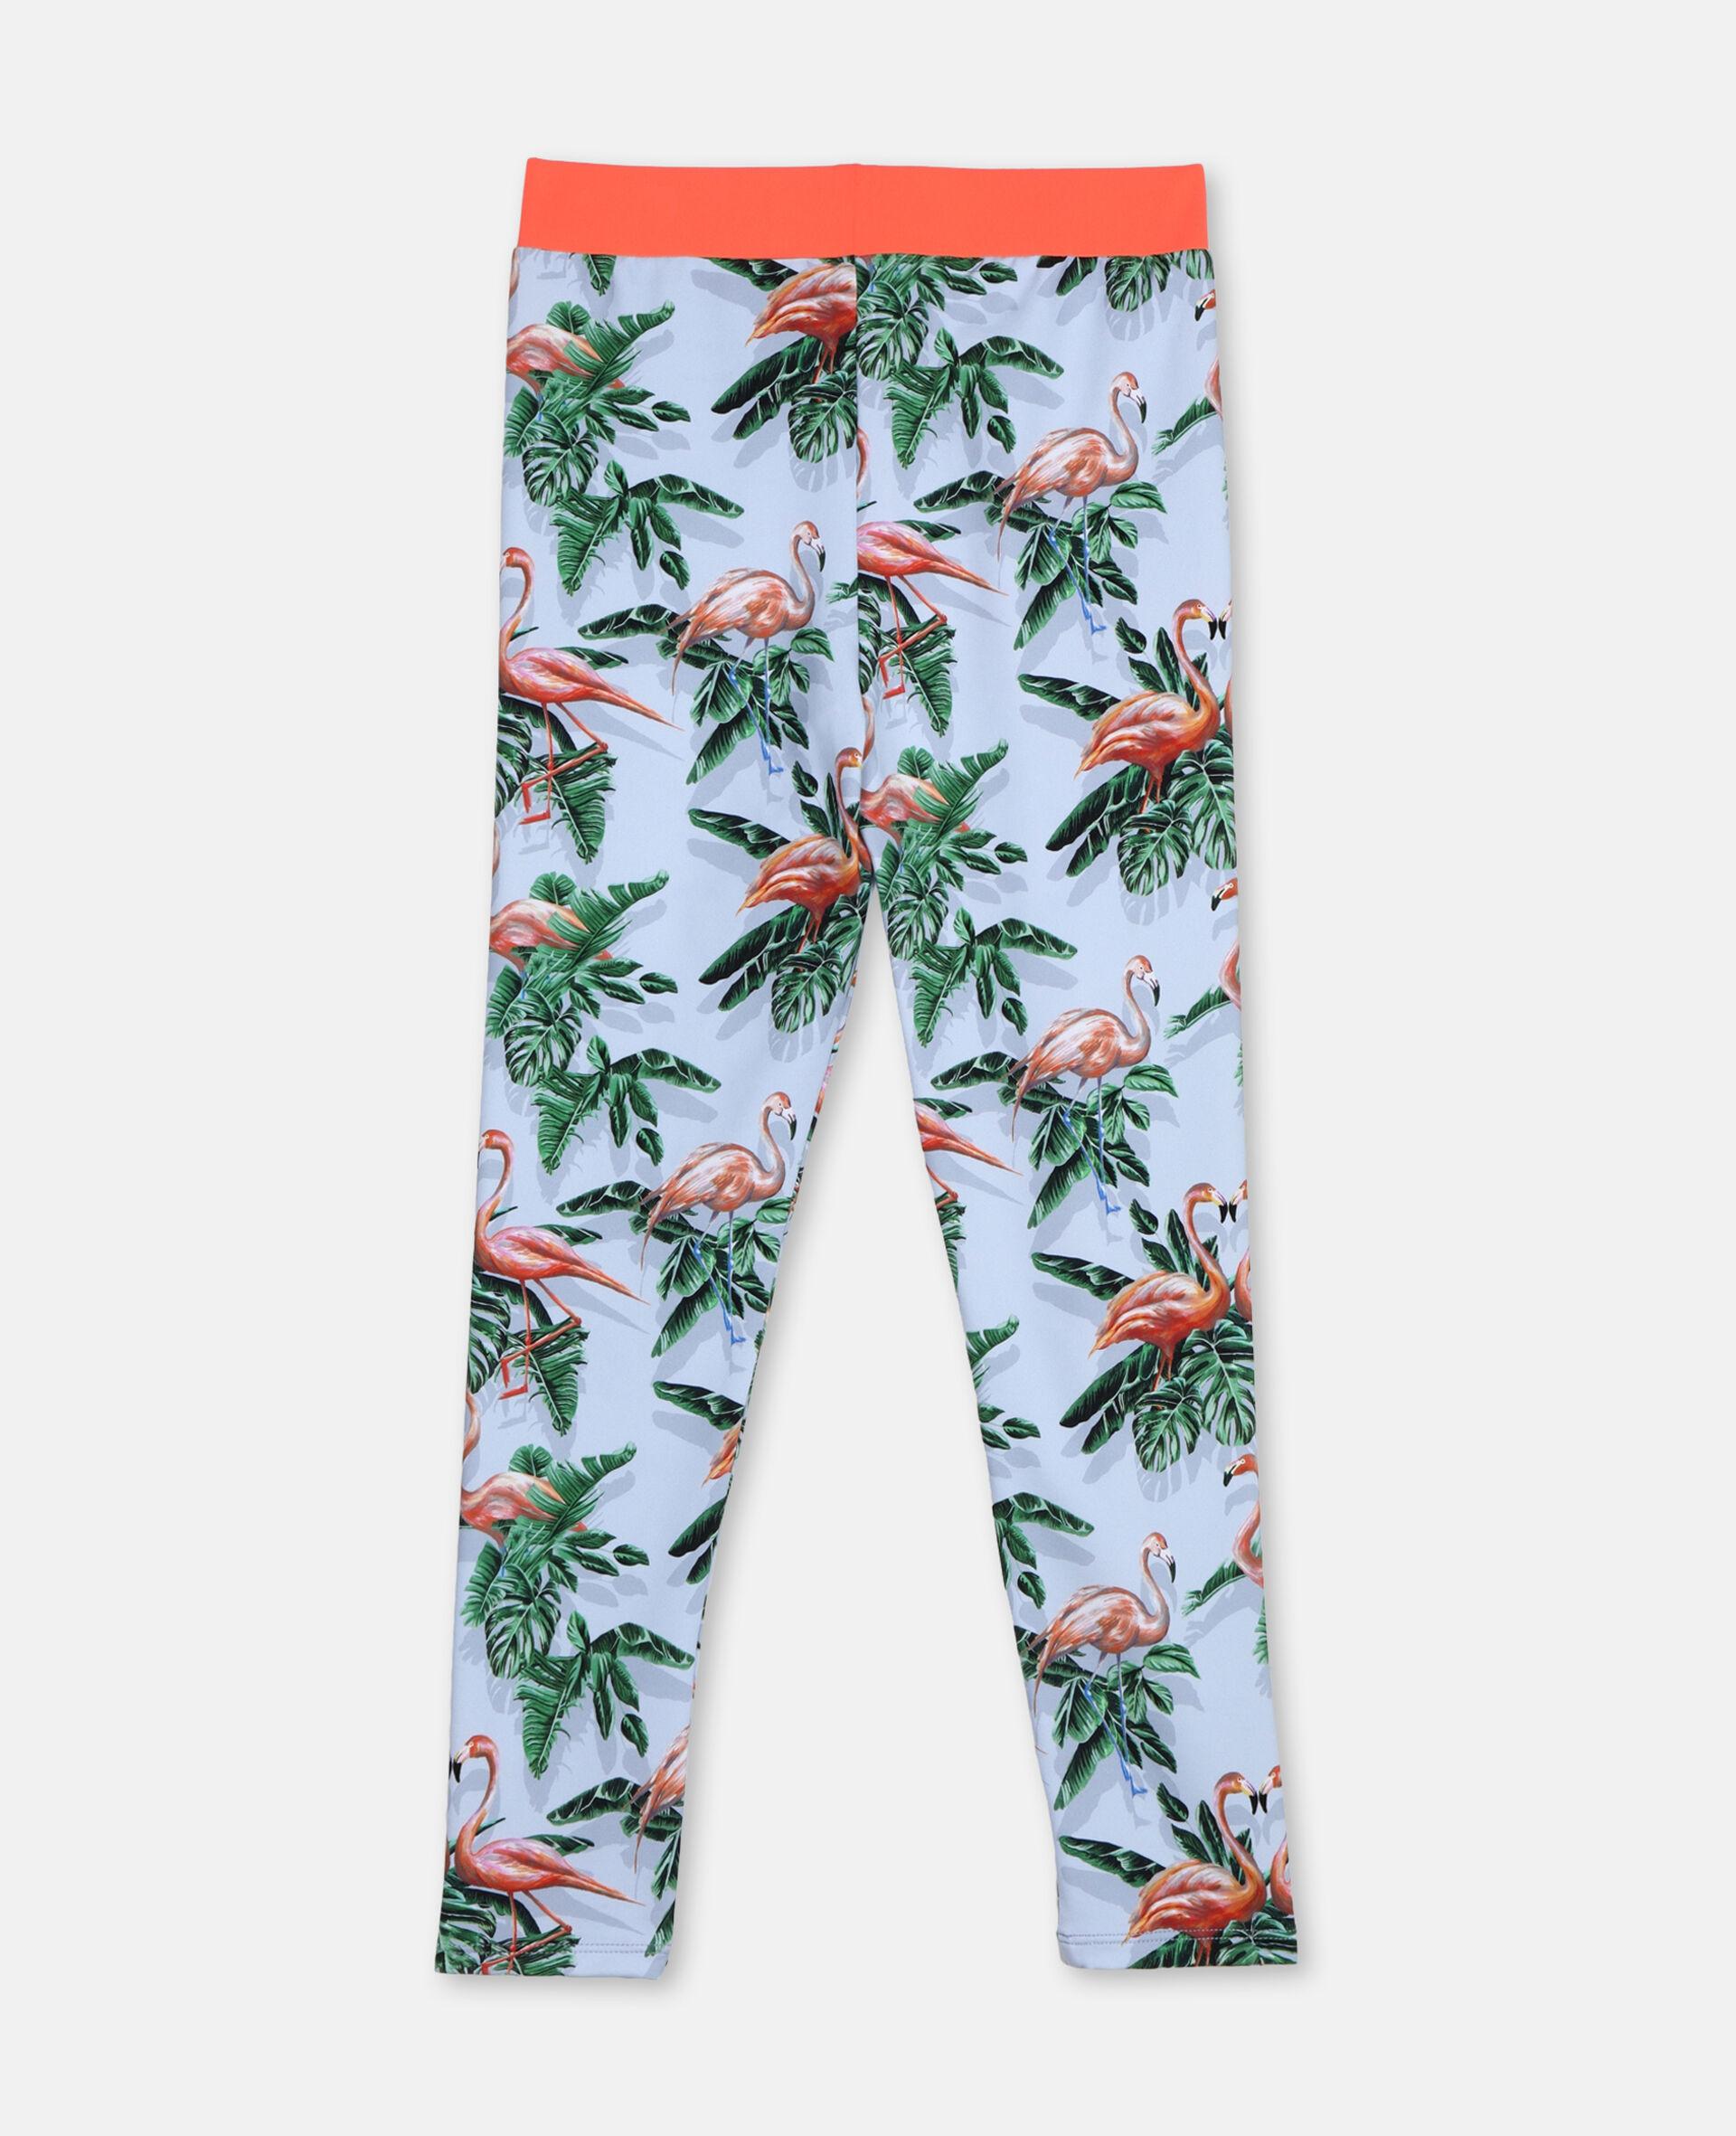 Painty Flamingo Leggings-Green-large image number 3